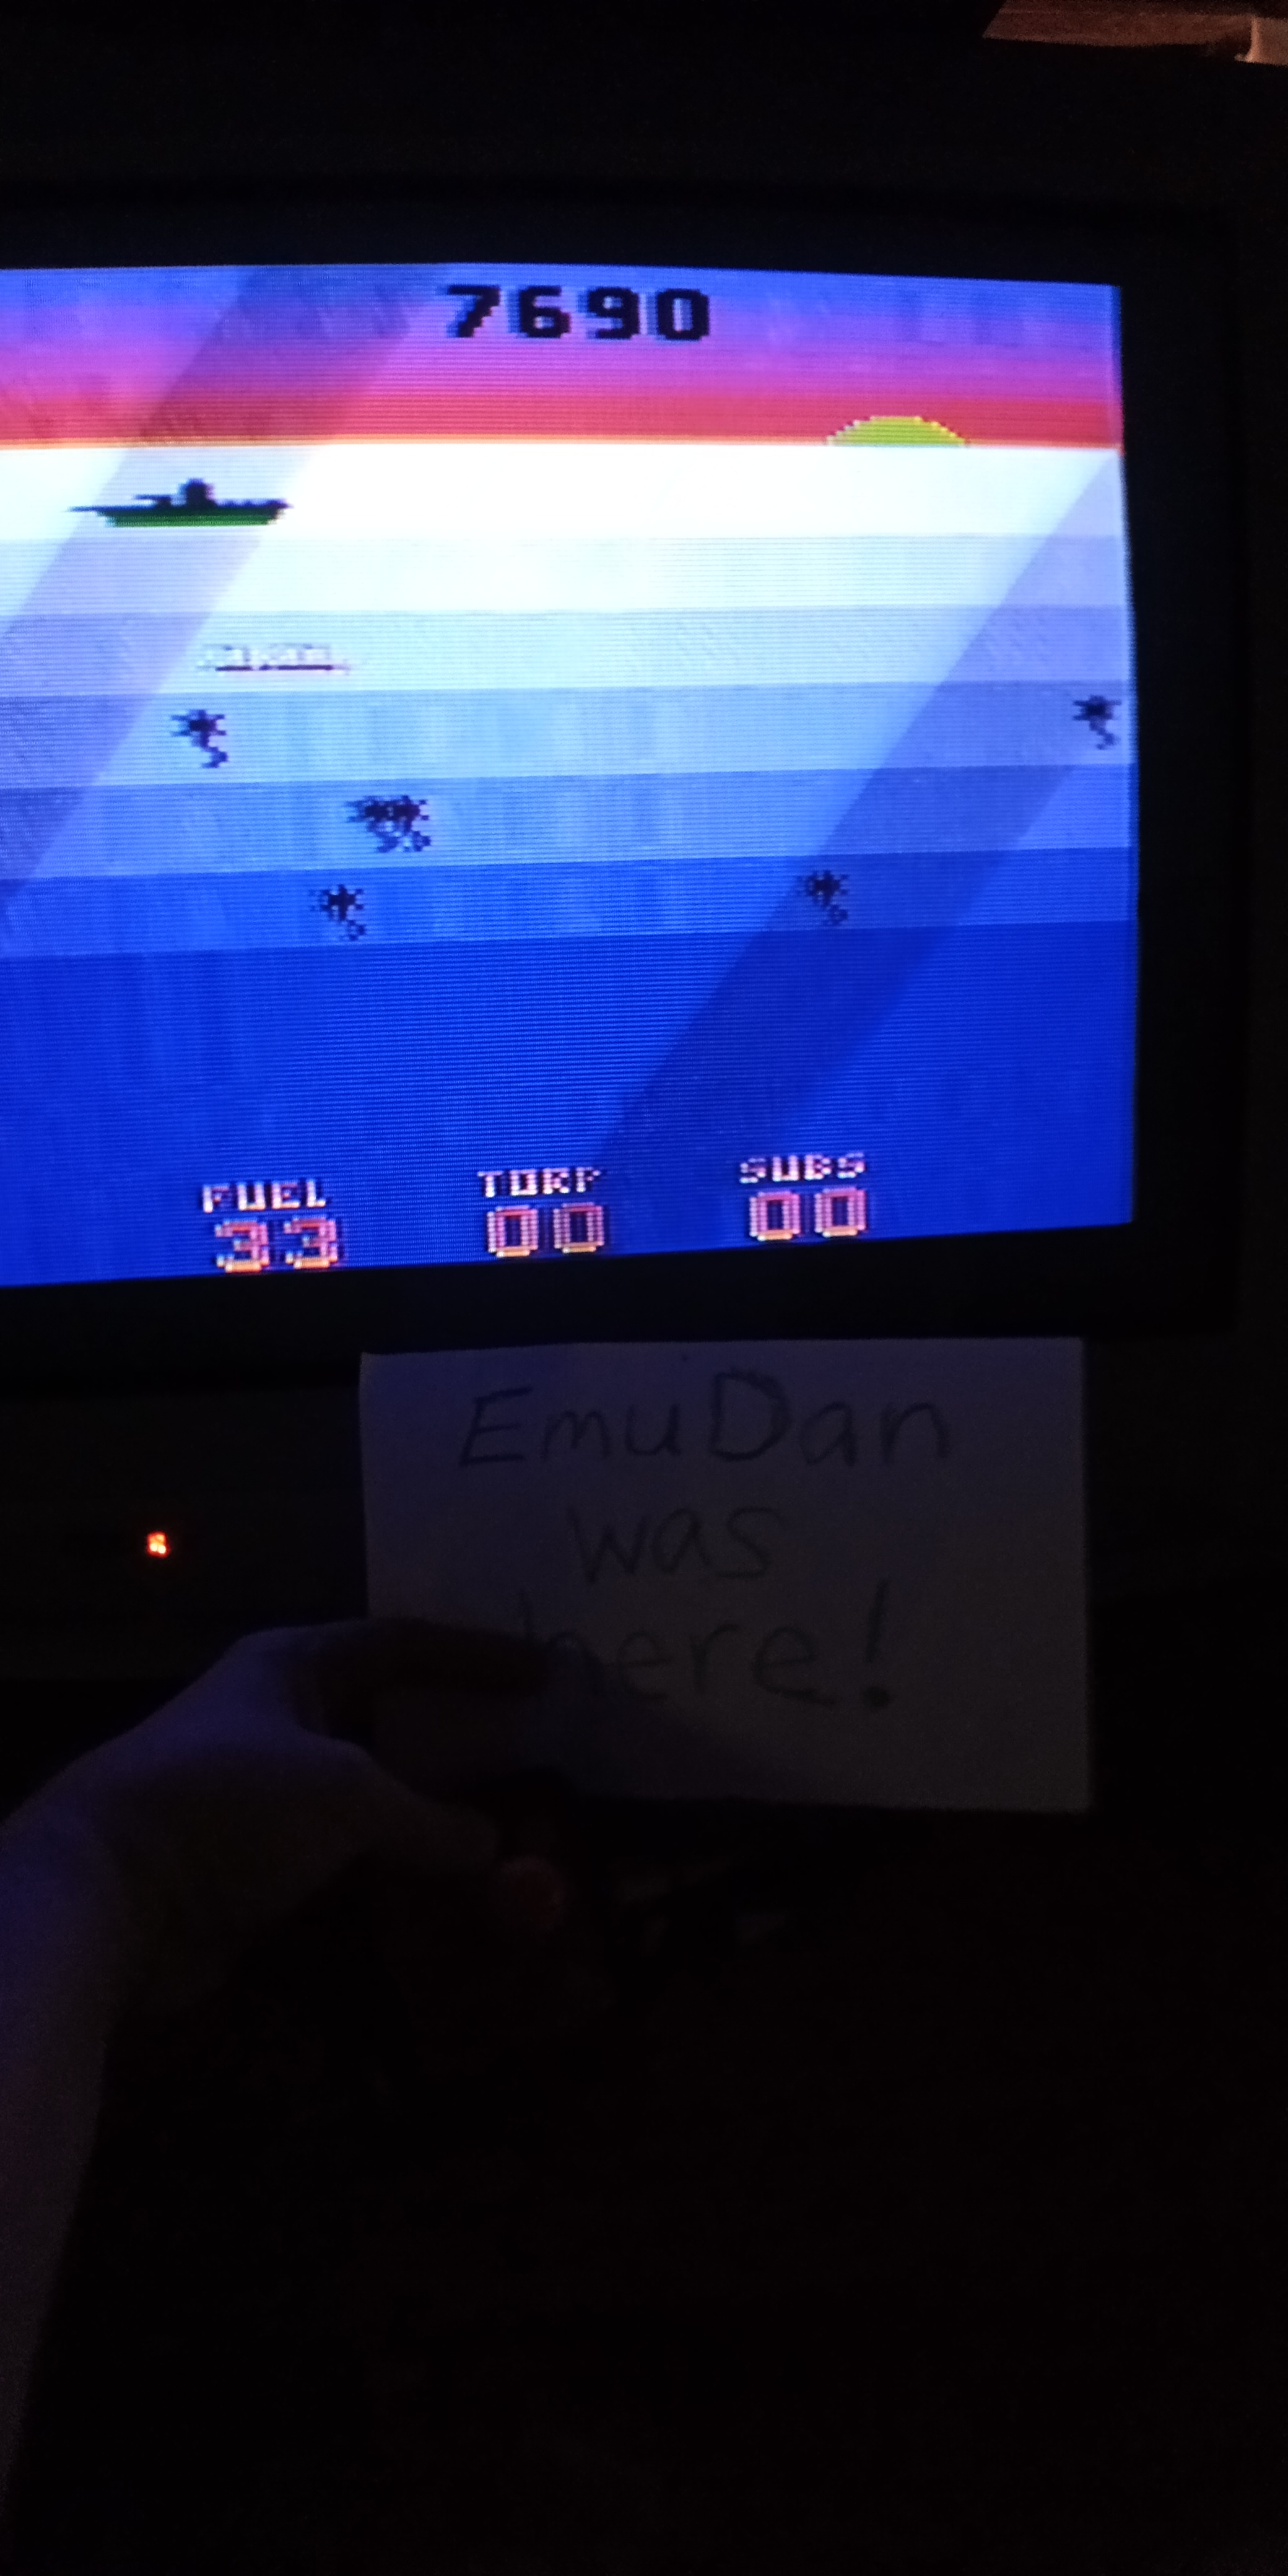 EmuDan: Seawolf (Atari 2600 Novice/B) 7,690 points on 2020-03-10 16:45:27